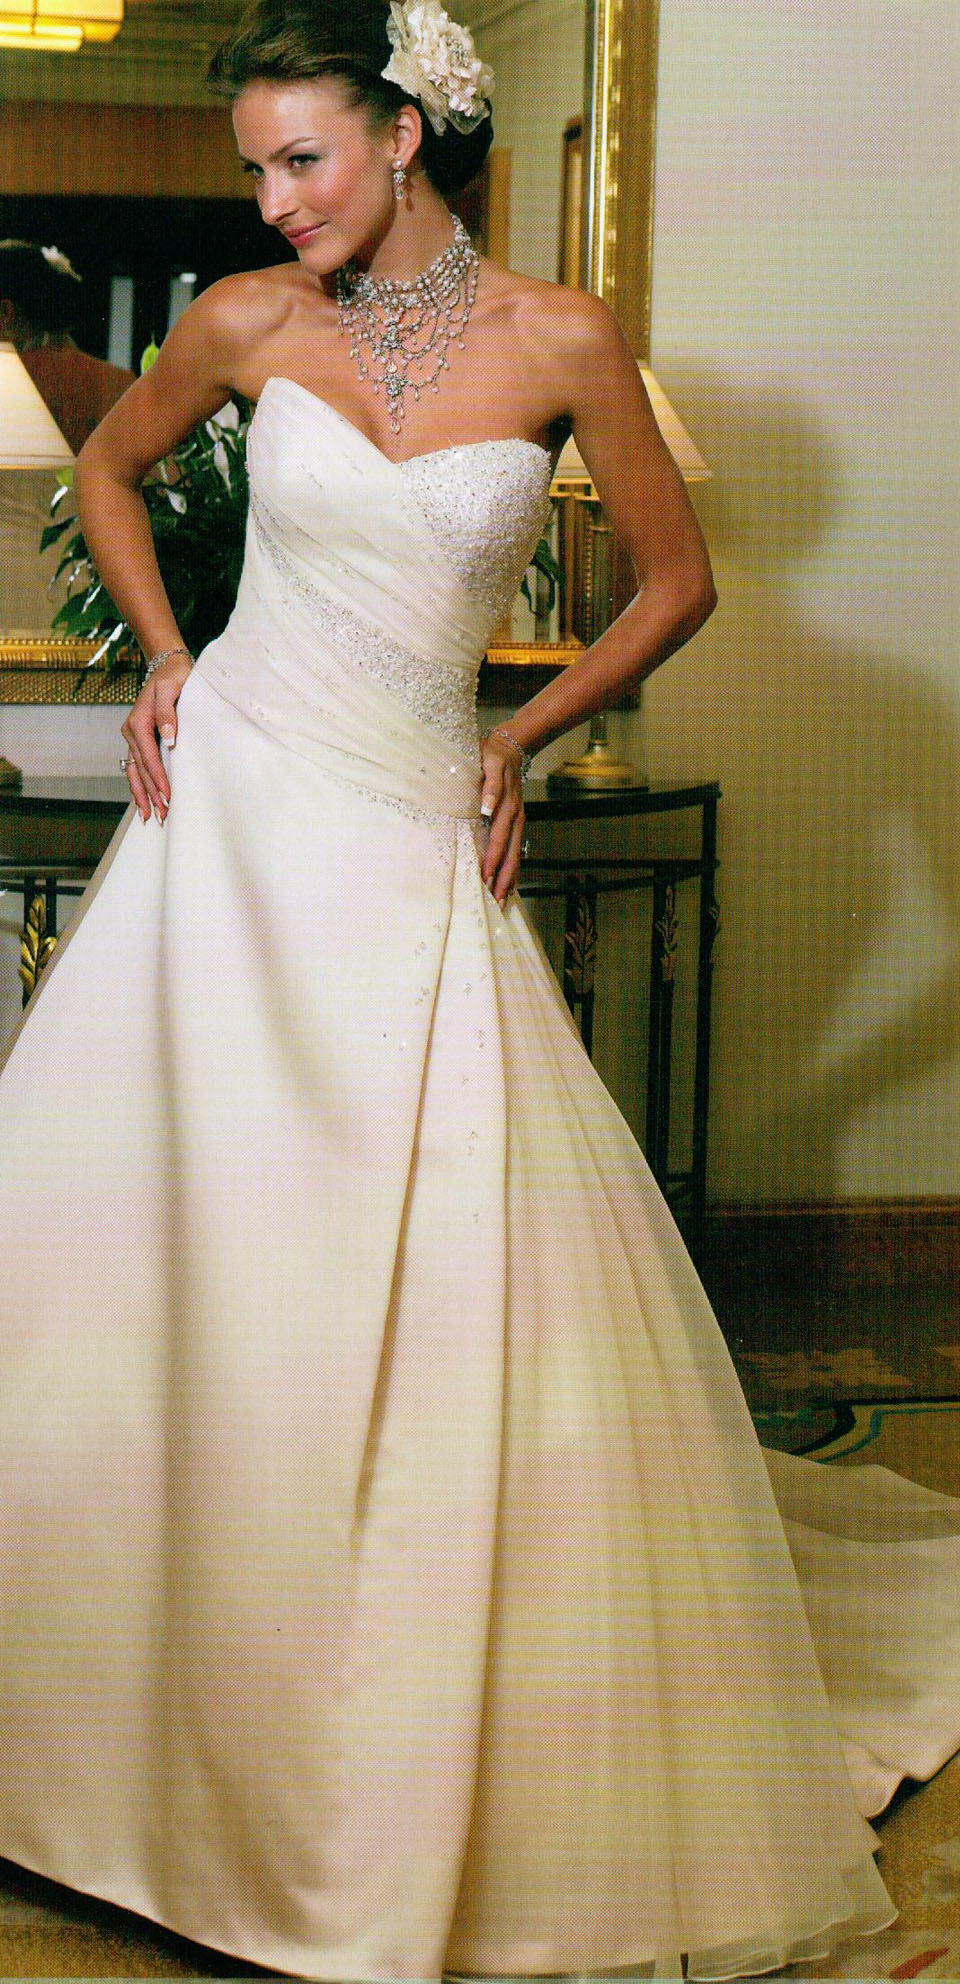 wedding gown rental las vegas nv wedding gown rental Wedding Gown Rental Las Vegas Nv 32